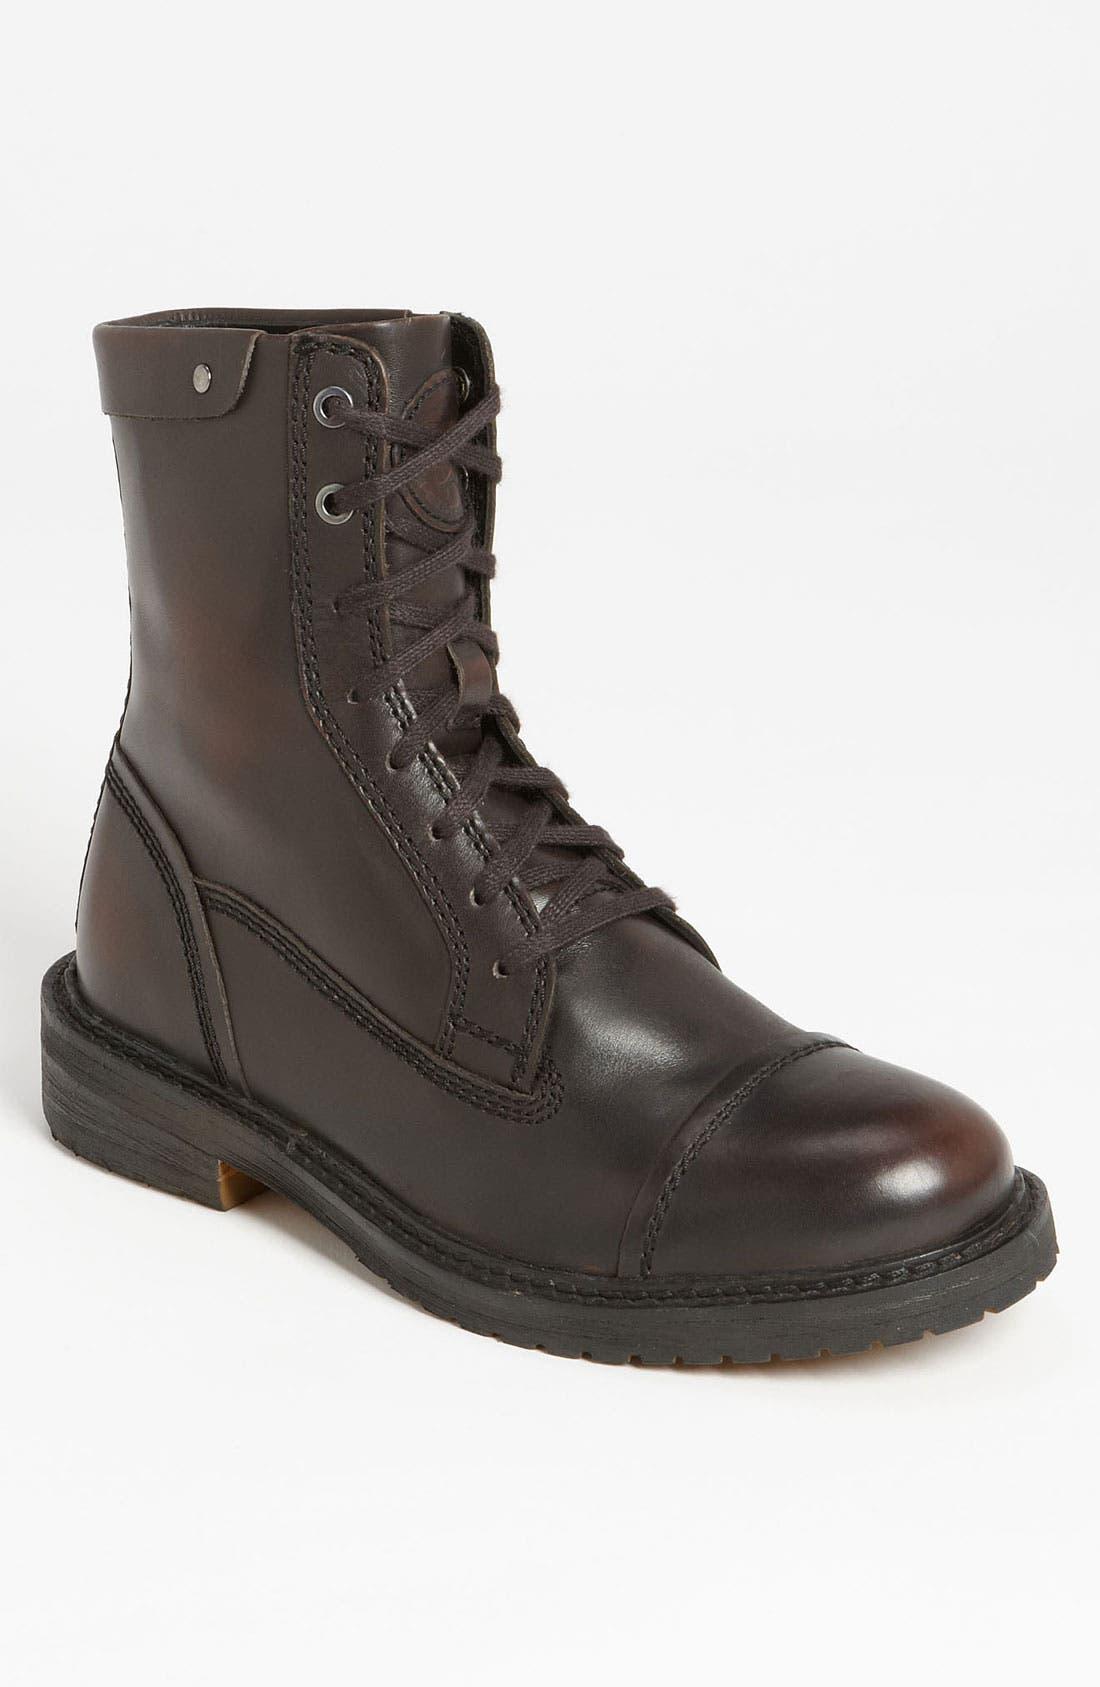 Alternate Image 1 Selected - DIESEL® 'Anfist Unplagged' Cap Toe Boot